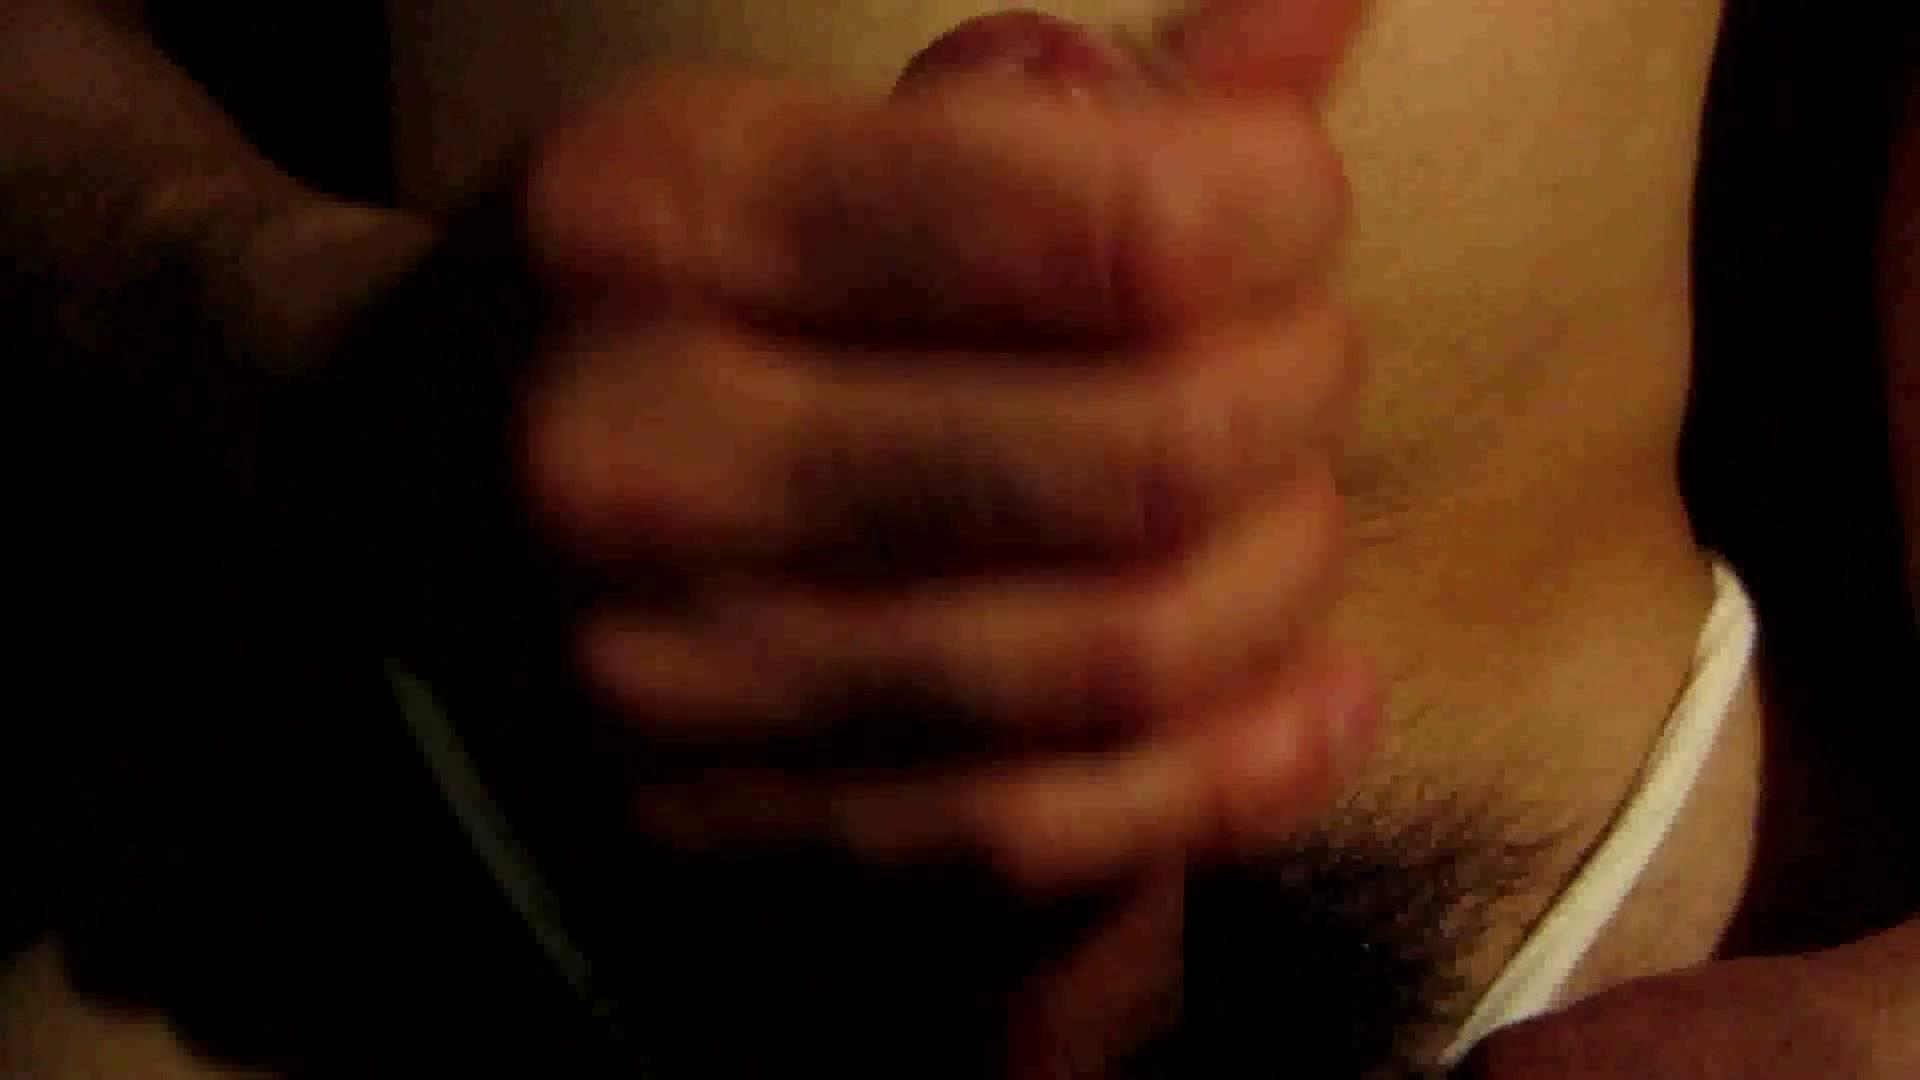 【HD】シャイだけど大胆な奴等 FILE.04 スリム美少年系ジャニ系 ゲイセックス画像 29連発 20